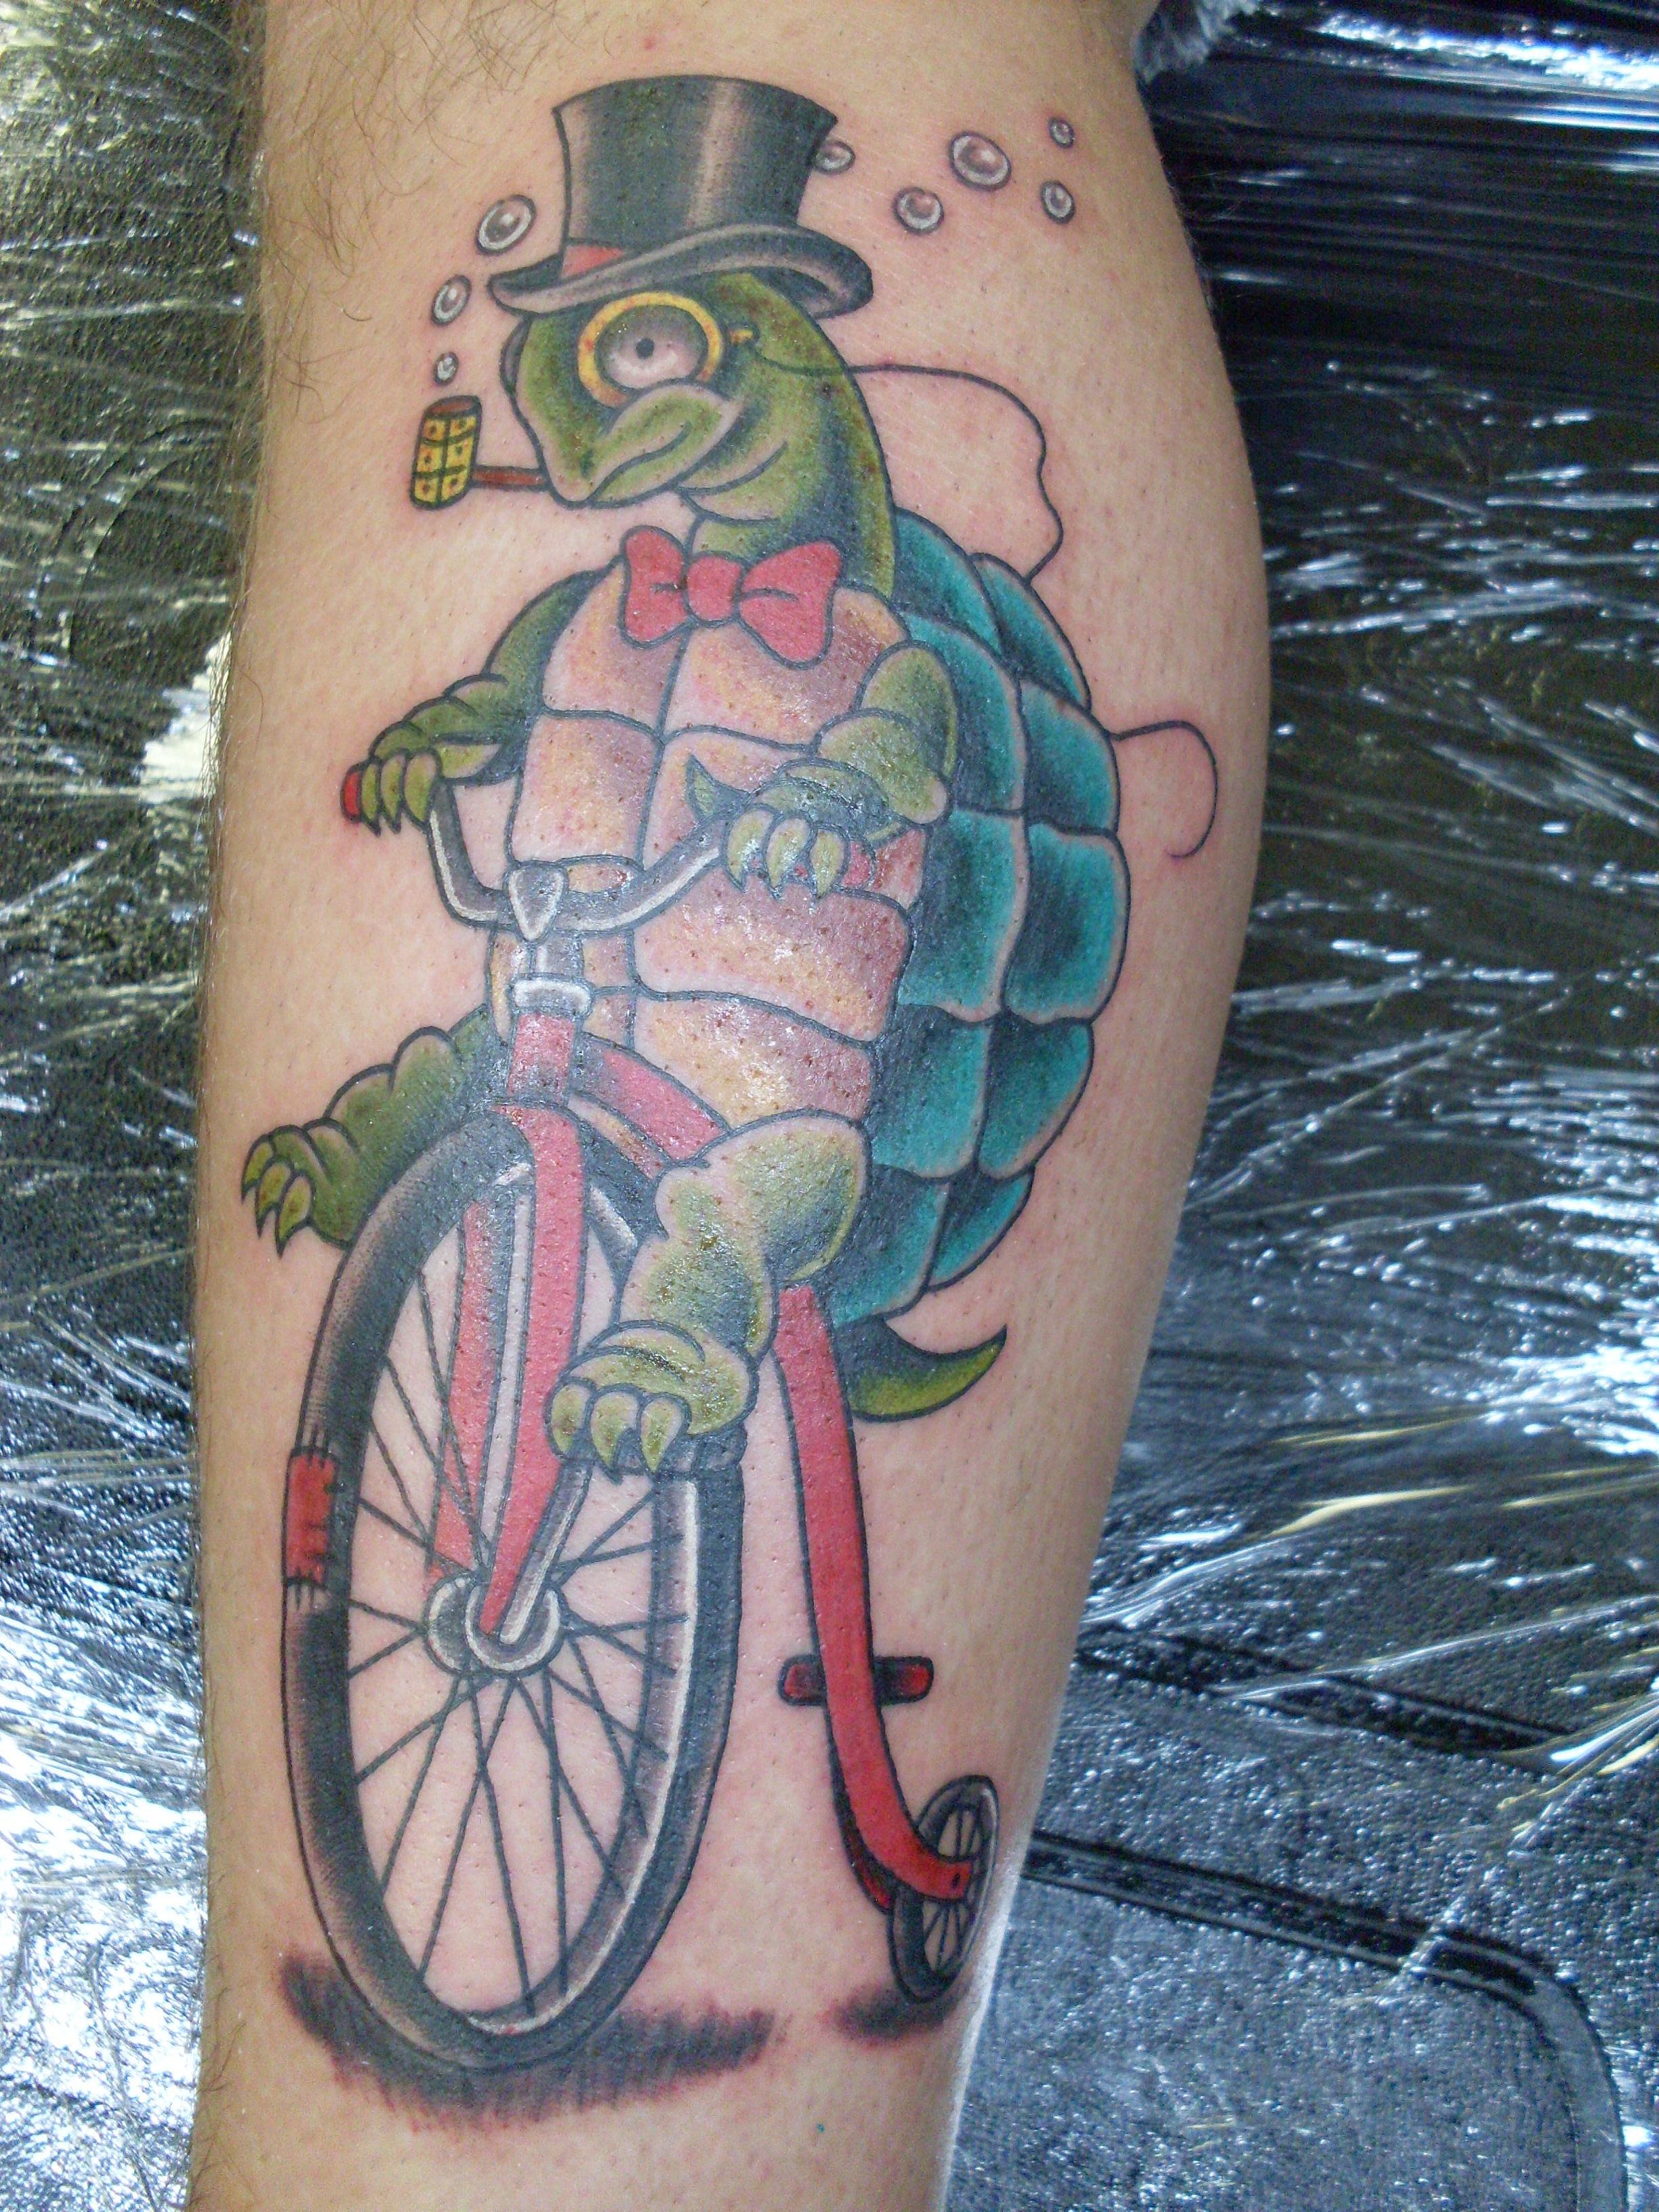 Phil luck tattoo artist located in las vegas phil luck for Tattoo artists las vegas